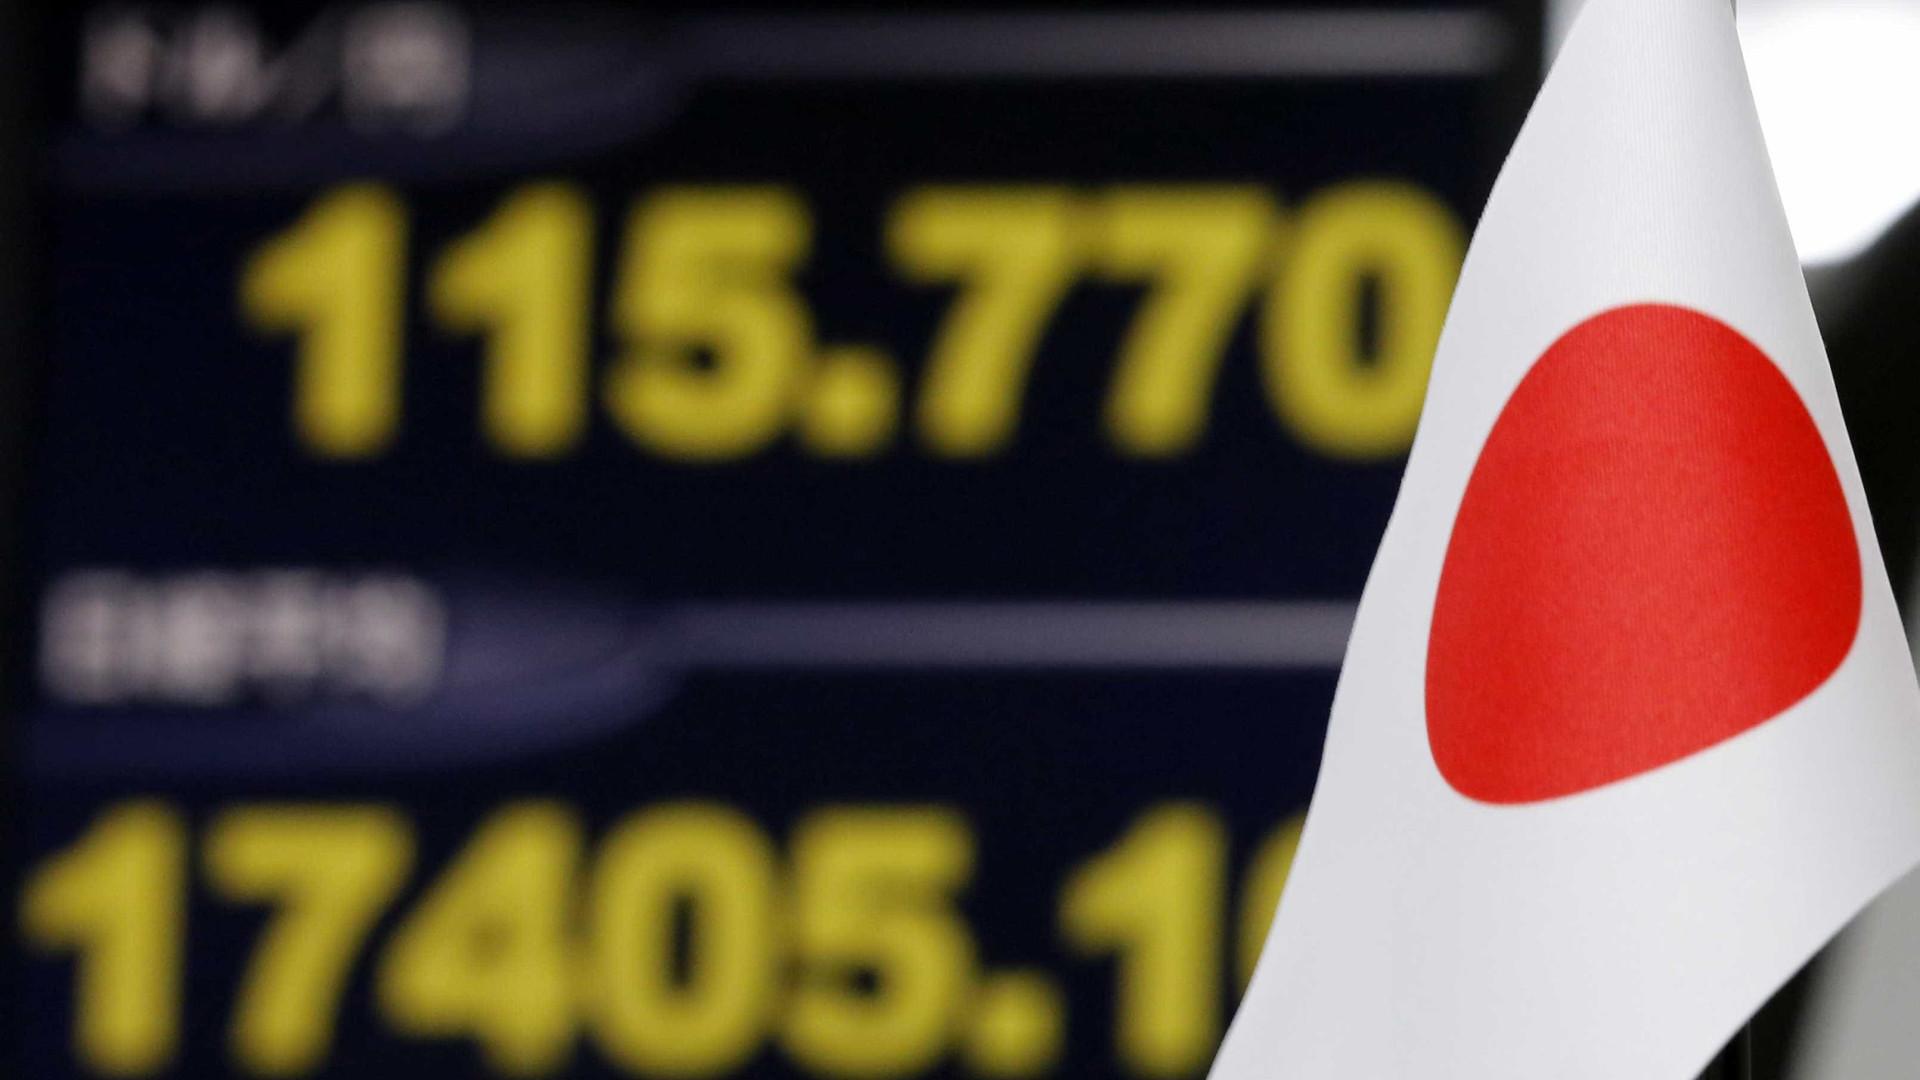 Bolsa de Tóquio sobe 0,38% no fecho